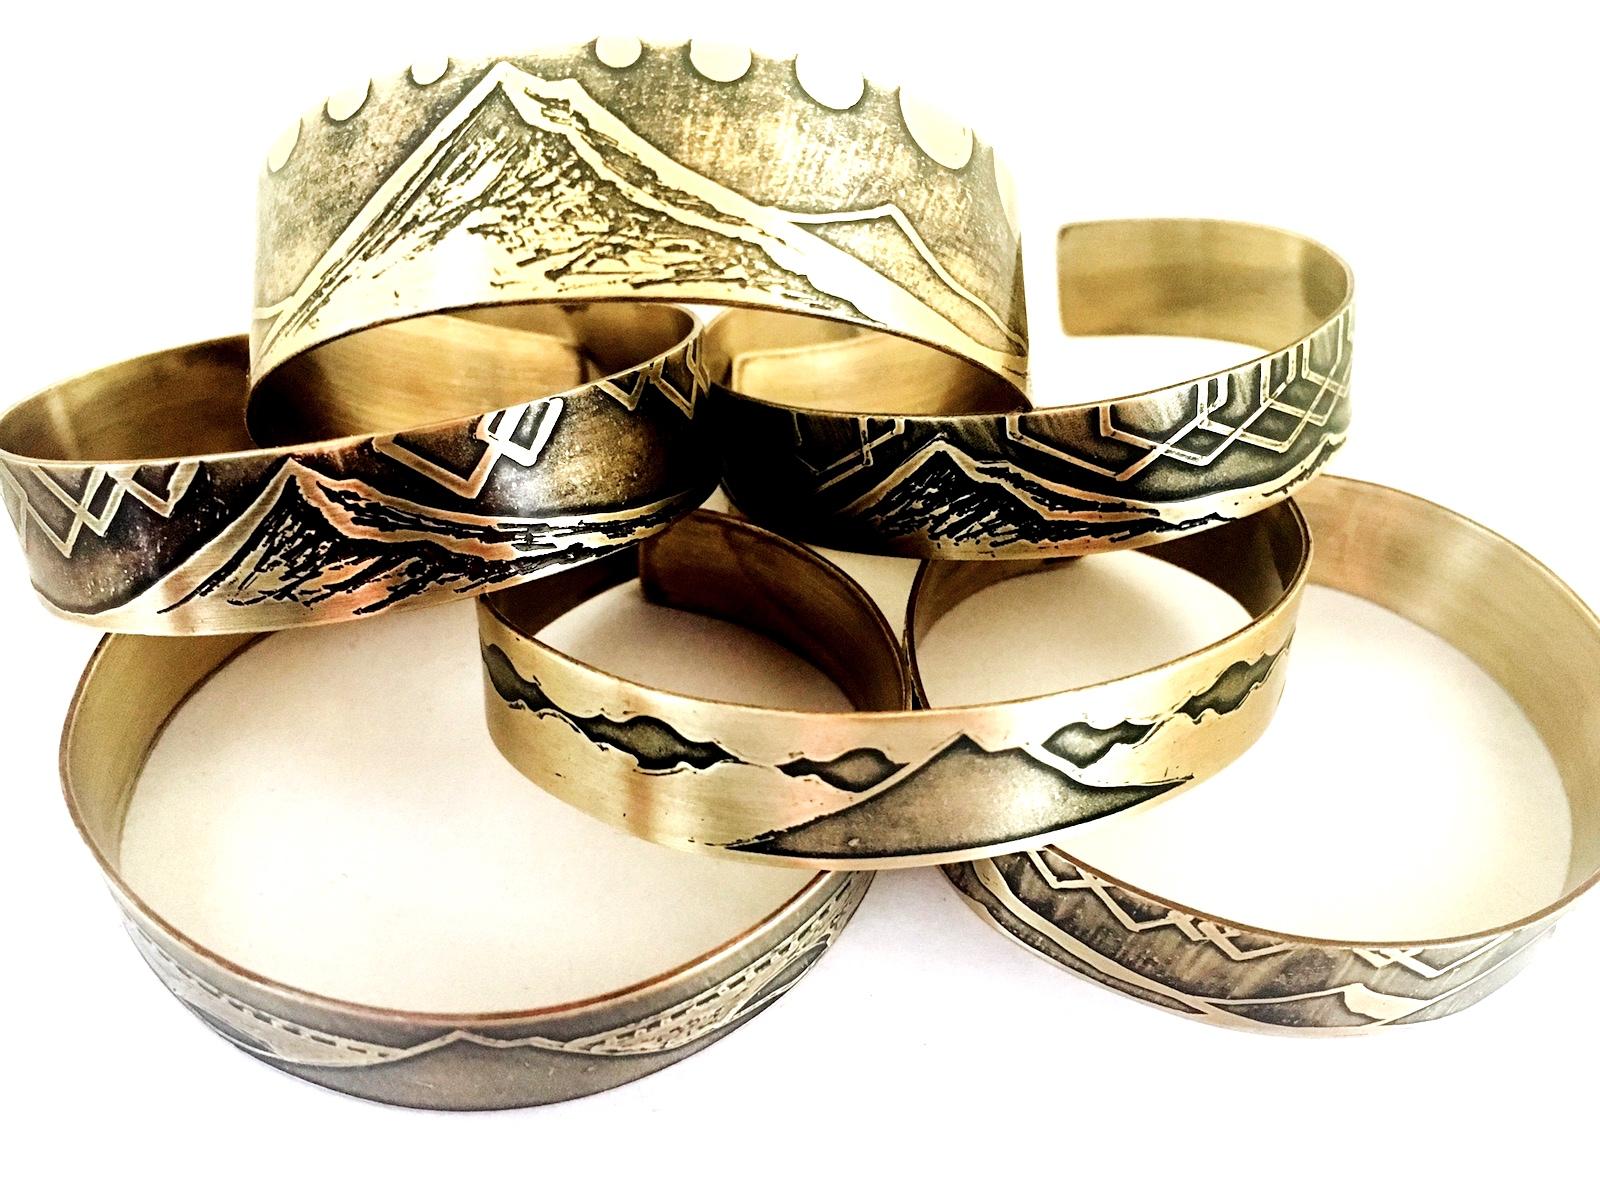 Bracelets and Cuffs